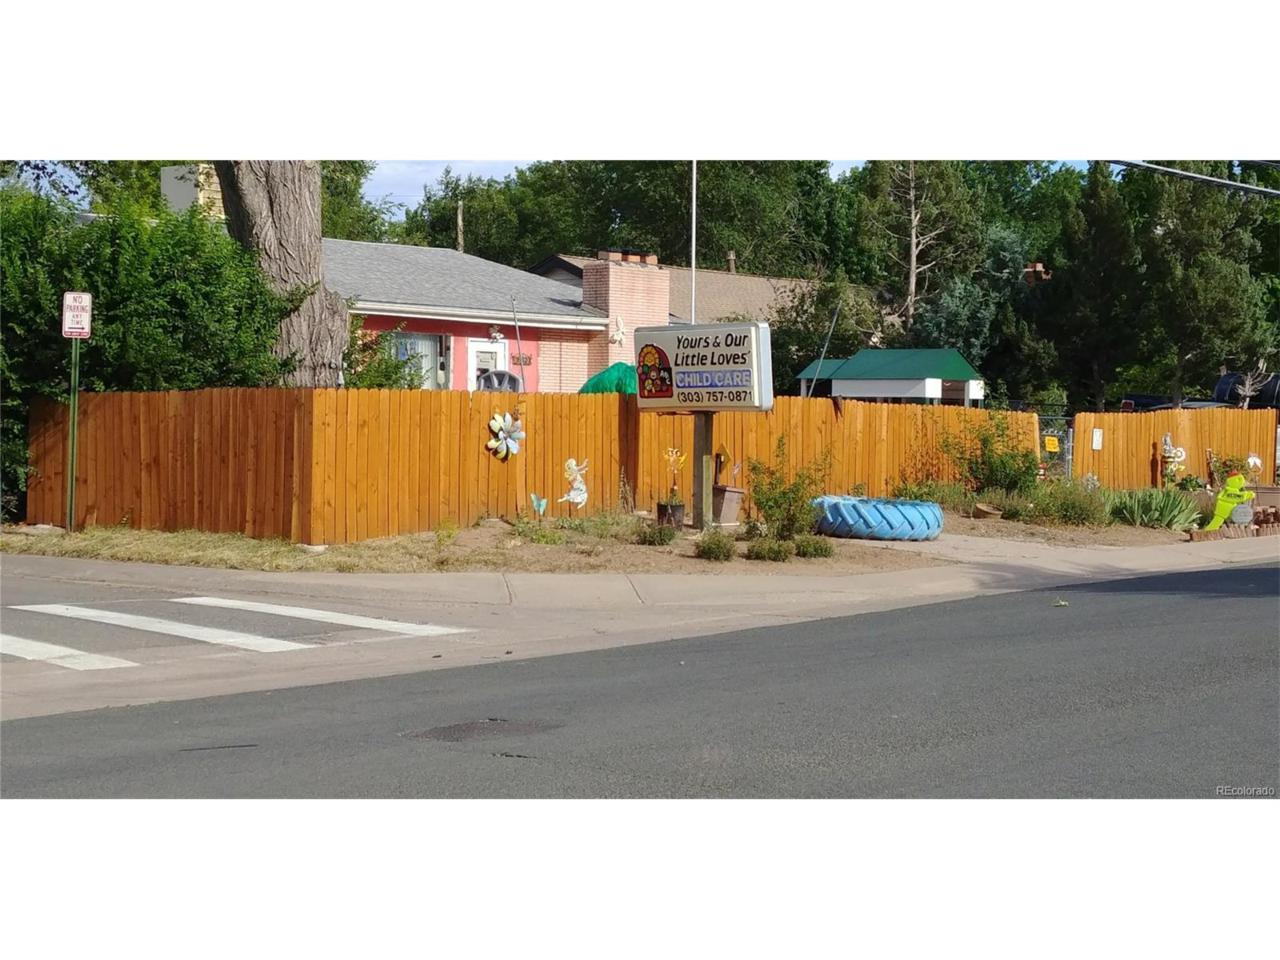 3060 S Dahlia Street, Denver, CO 80222 (MLS #7996026) :: 8z Real Estate